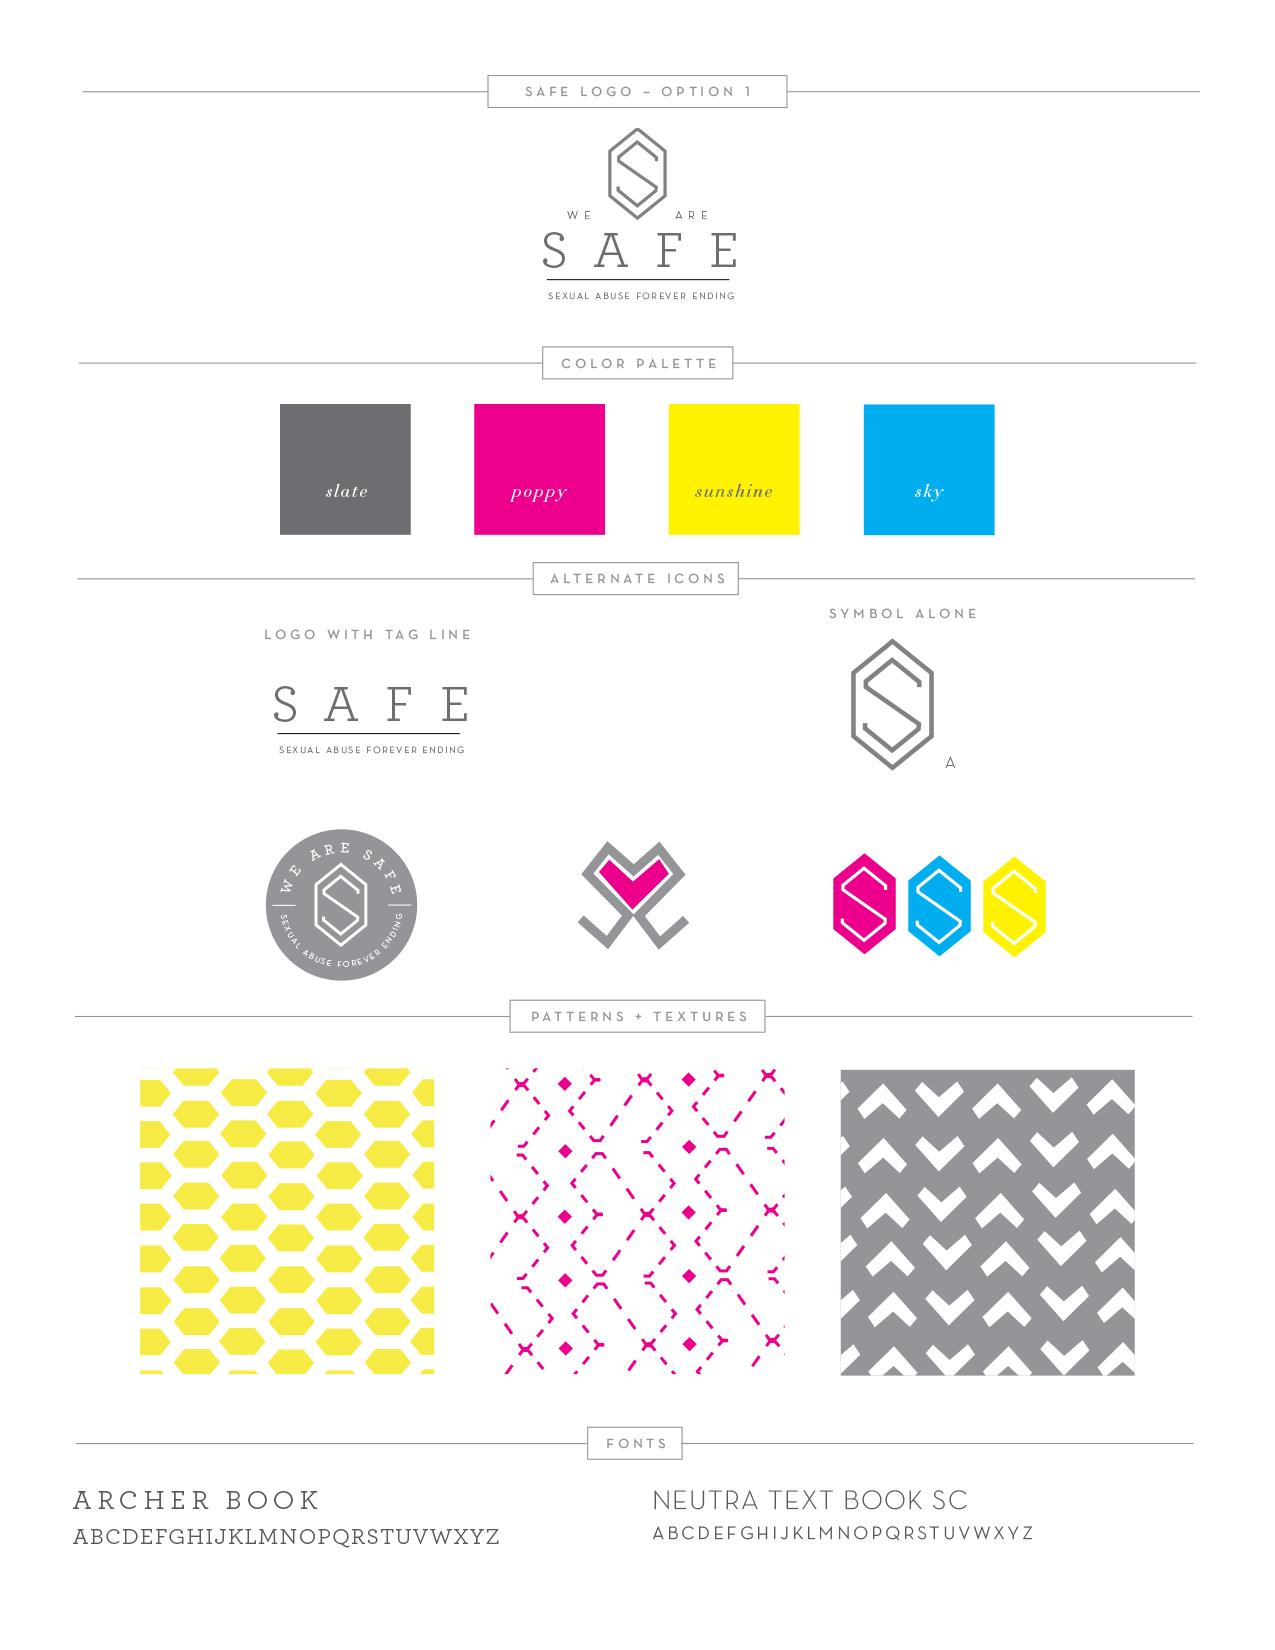 SAFE brand boards - R1v2-1.jpg